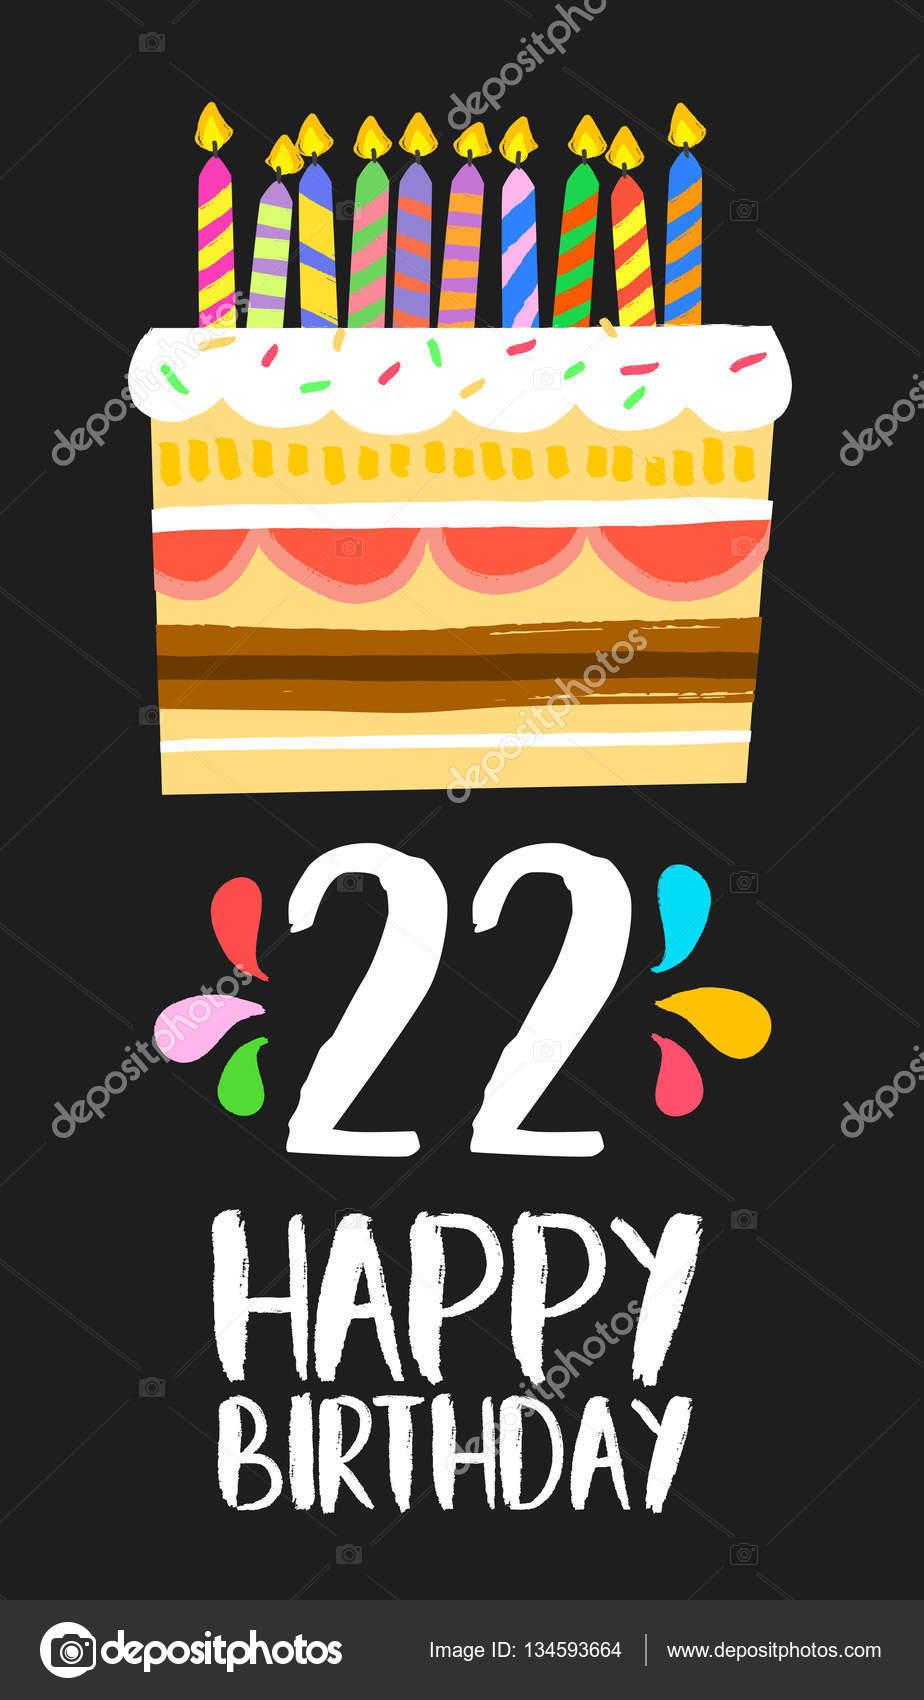 Remarkable Pictures 22 Birthday Cake Ideas Happy Birthday Cake Card 20 Personalised Birthday Cards Paralily Jamesorg